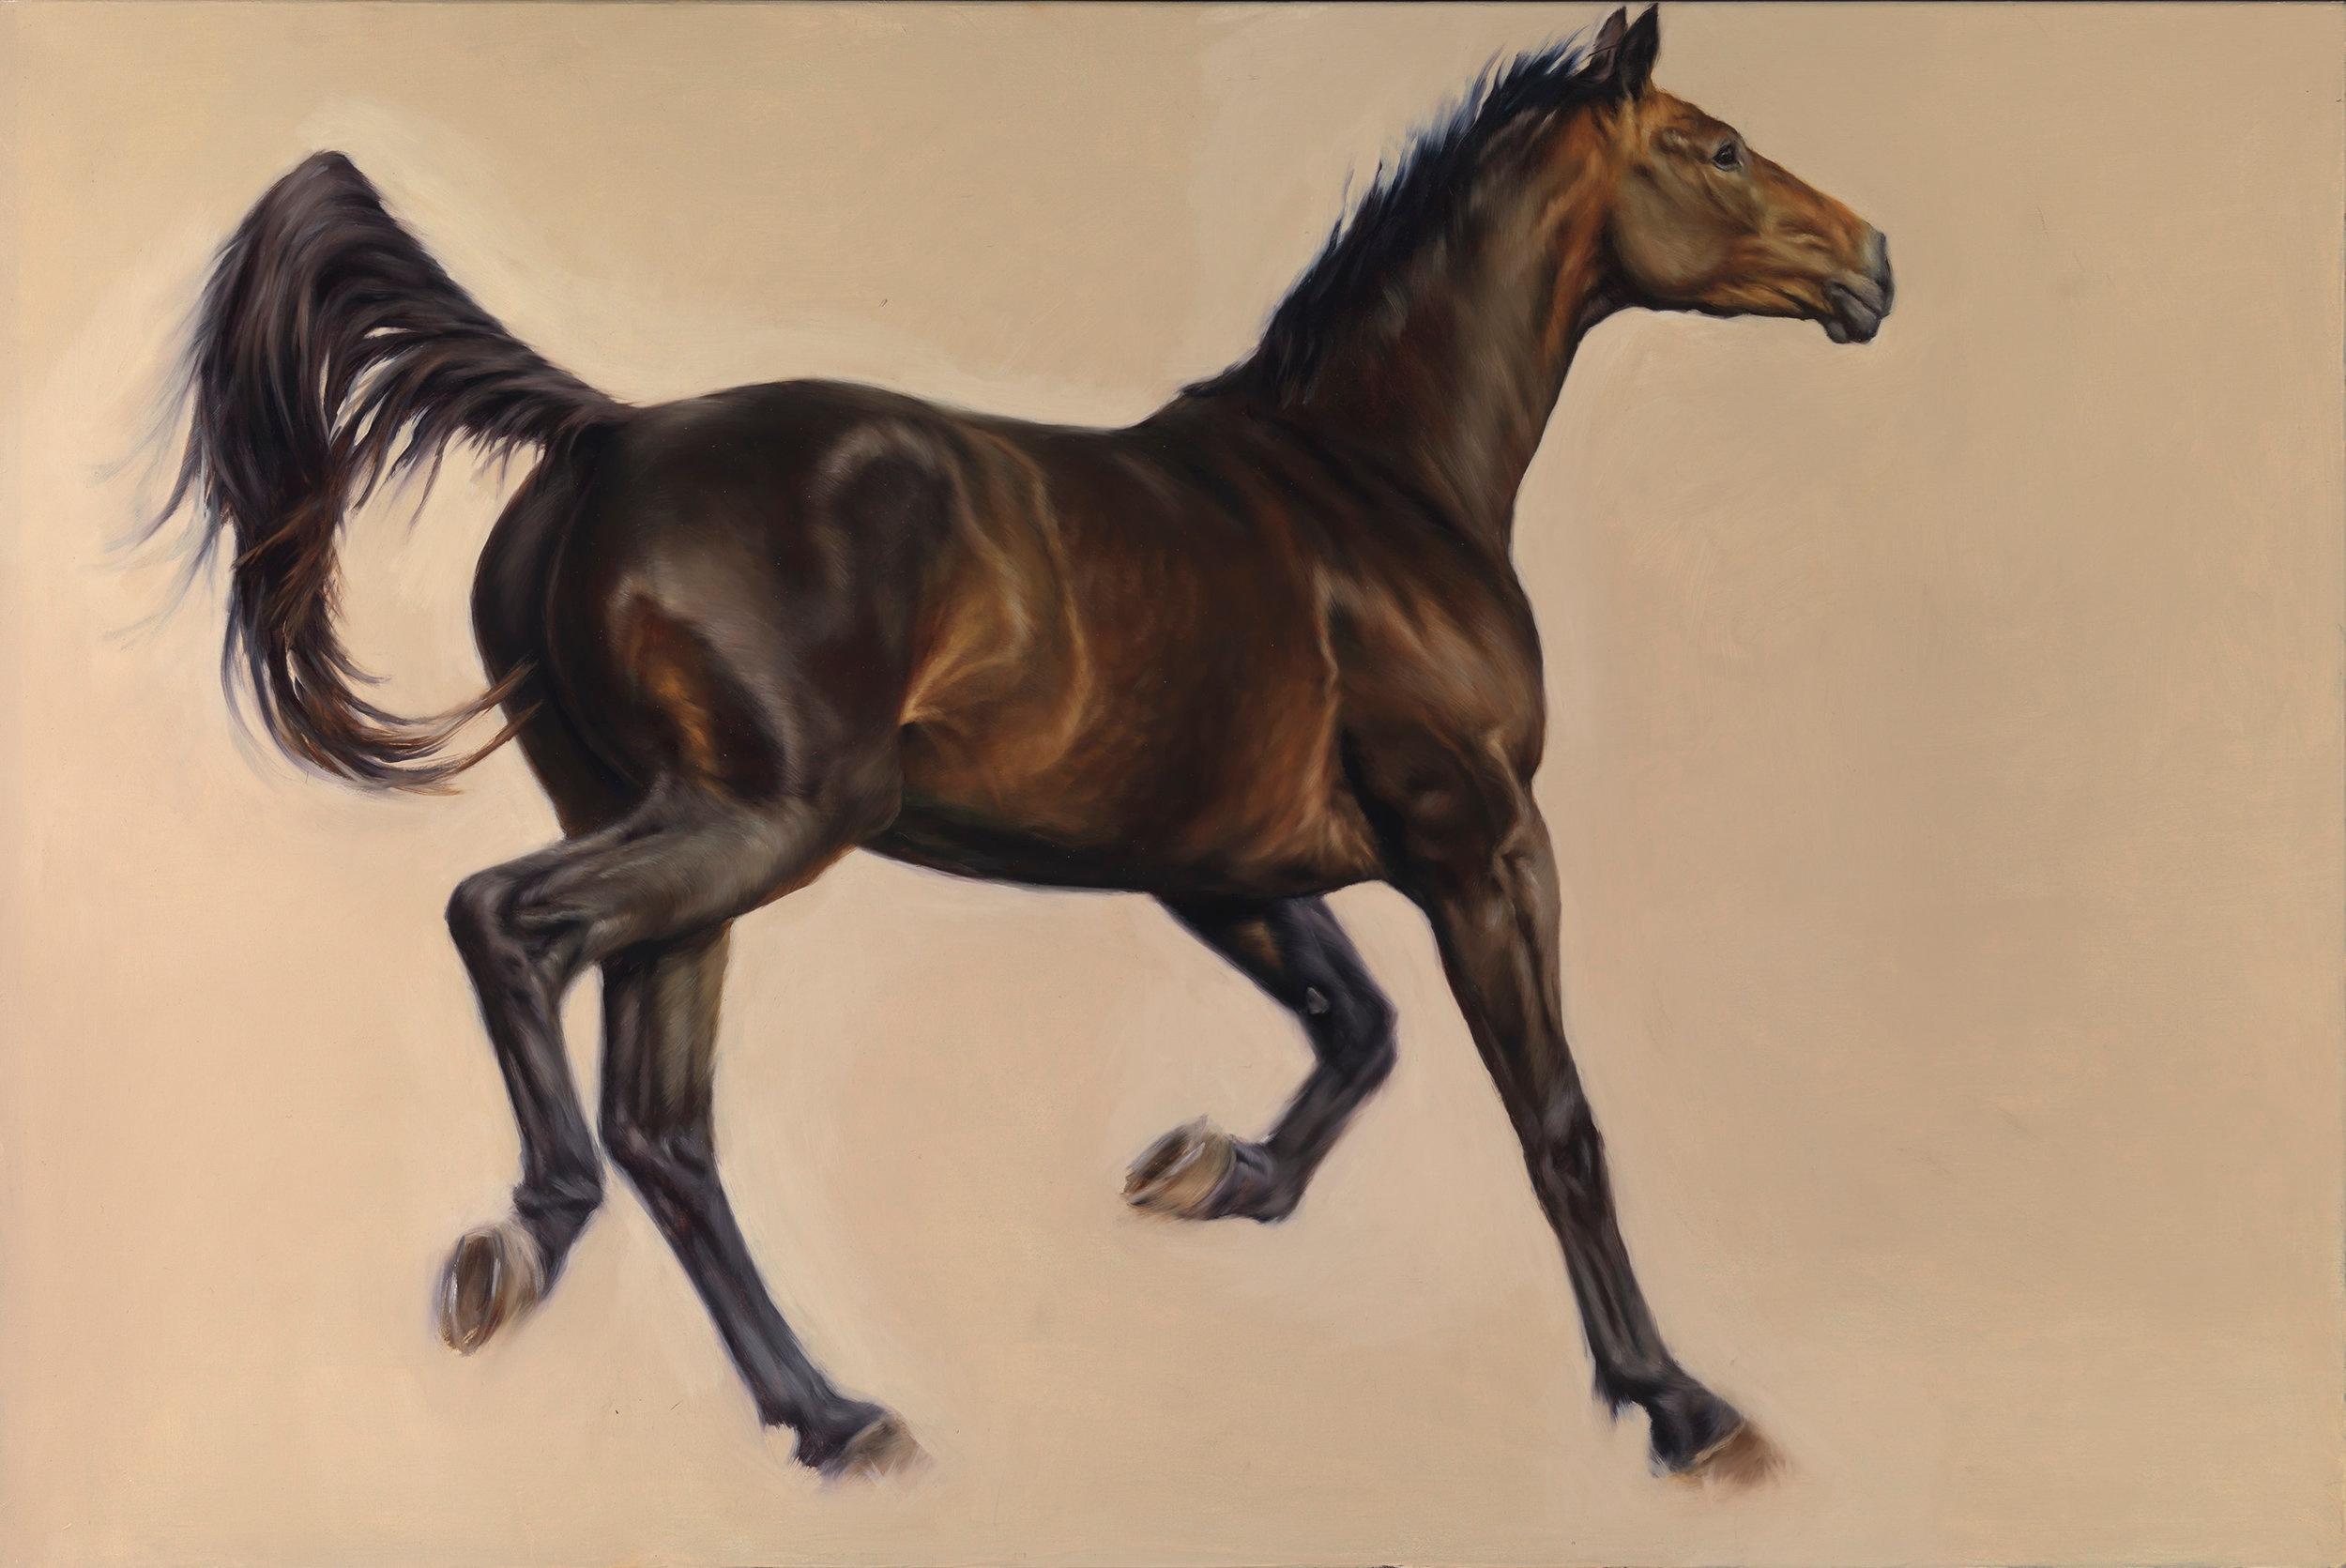 Horse_100x150_3908.jpg